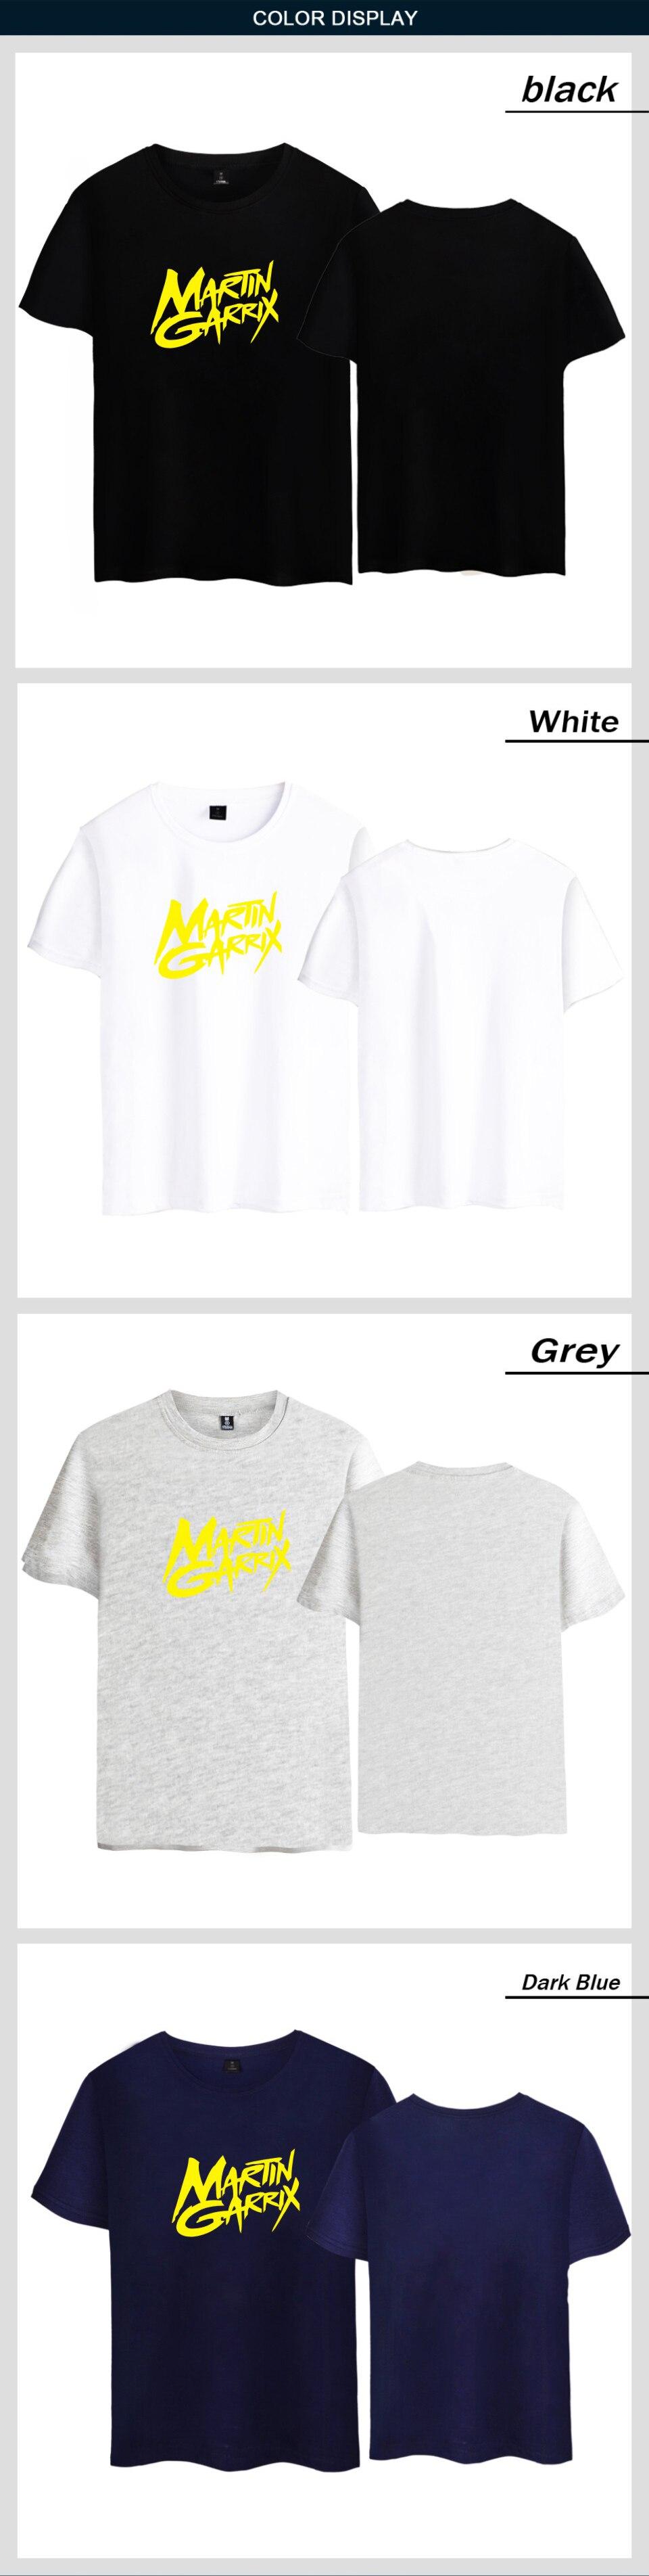 2017 Men/Women Cotton Tshirt Music DJ Martin Garrix T shirt Print Casual Multicolor Short Sleeve Tops Tees Hip Hop Rock Clothing